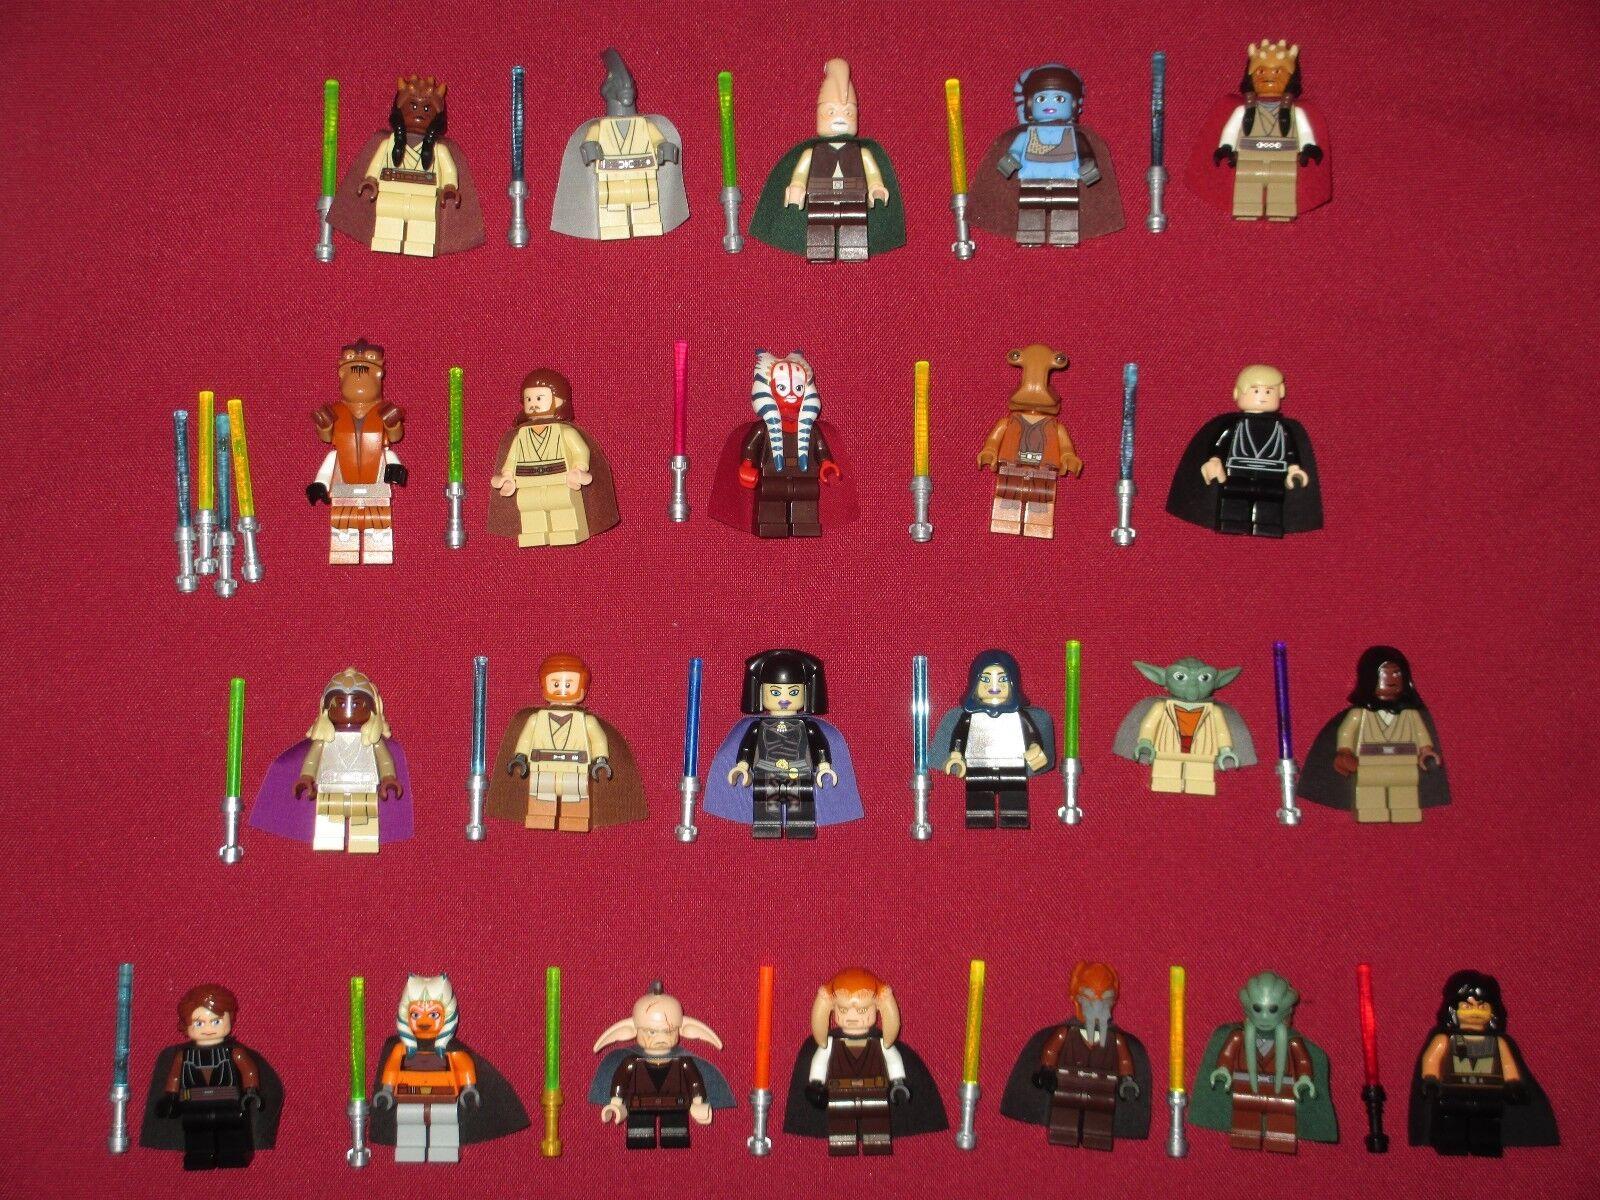 LEGO LEGO LEGO Star Wars Minifigures LOT. Aayla,Agen KOLAR,Eeth,Qui,Ithorian,Ki Adi,Yoda + 34de9e